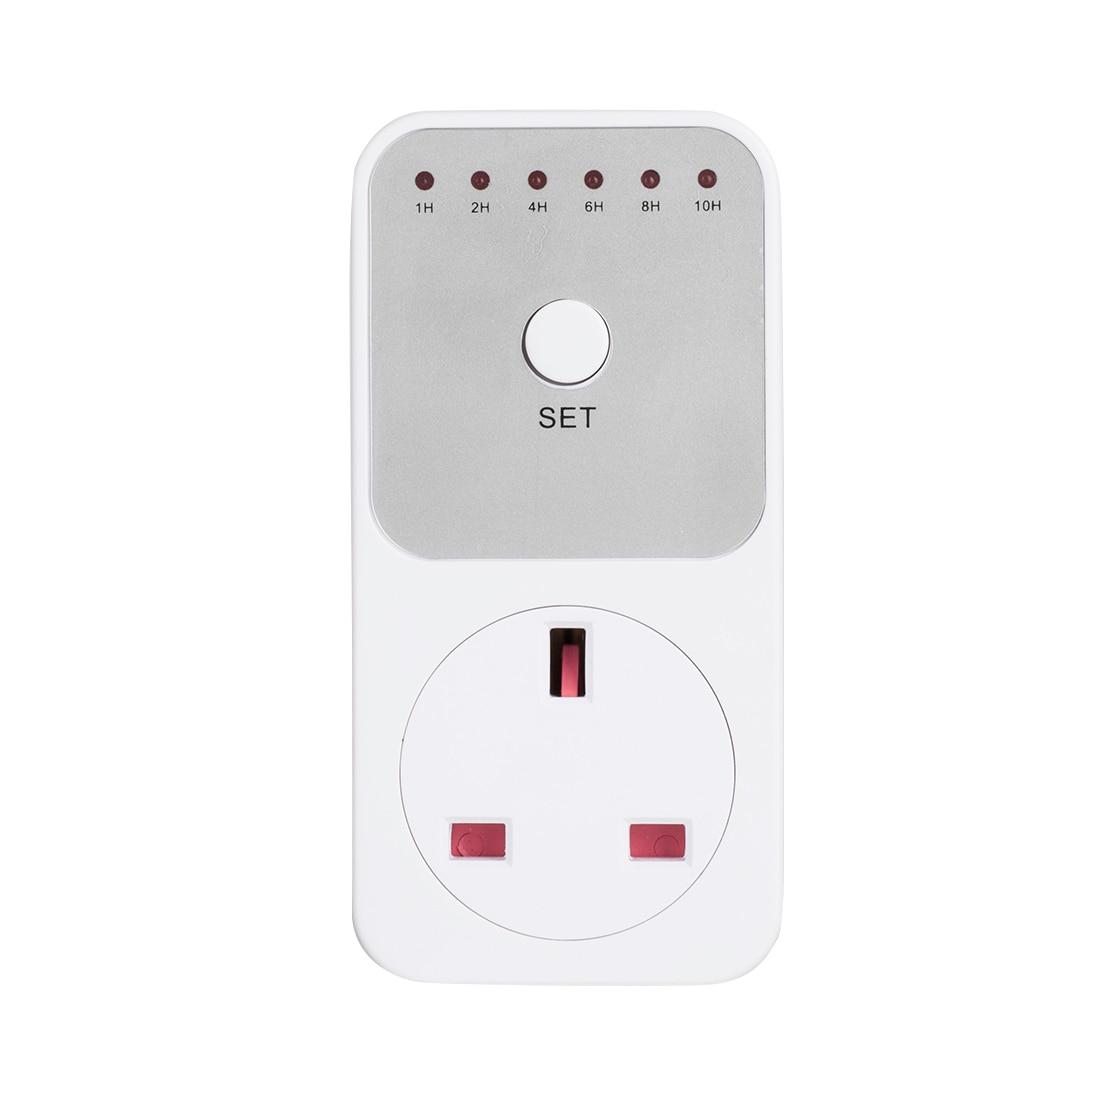 цена на 10Hr Timer Socket Countdown Intelligent Time Setting Swtich Timer Control Socket Electricity Power Metering US EU UK Plug Socket